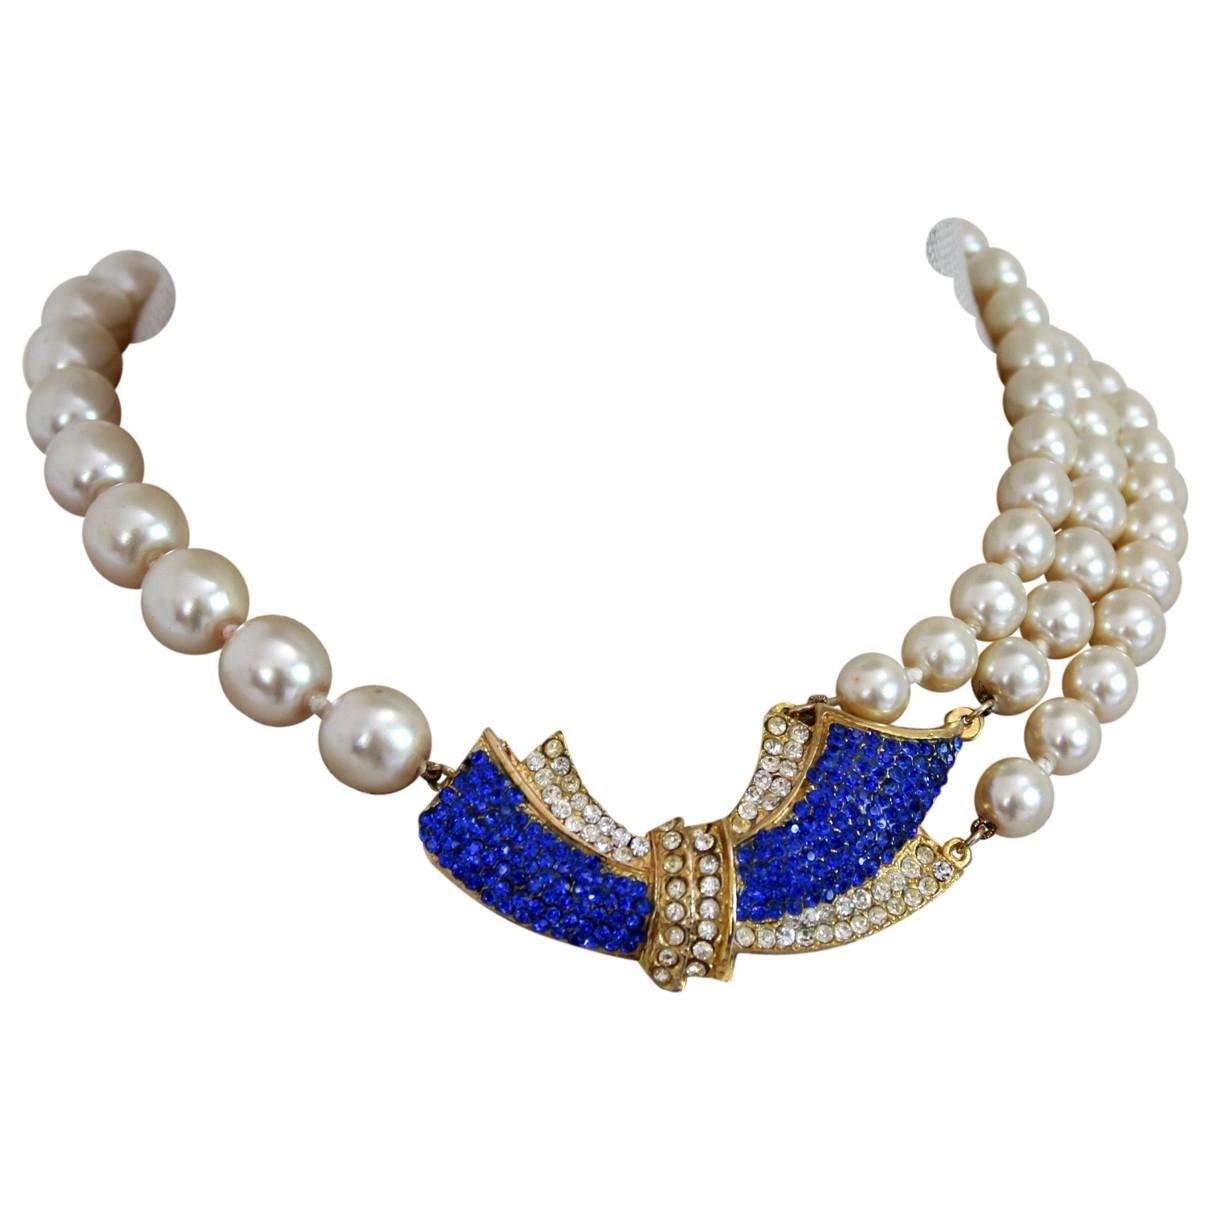 Pierre Cardin \N White Pearls necklace for Women \N